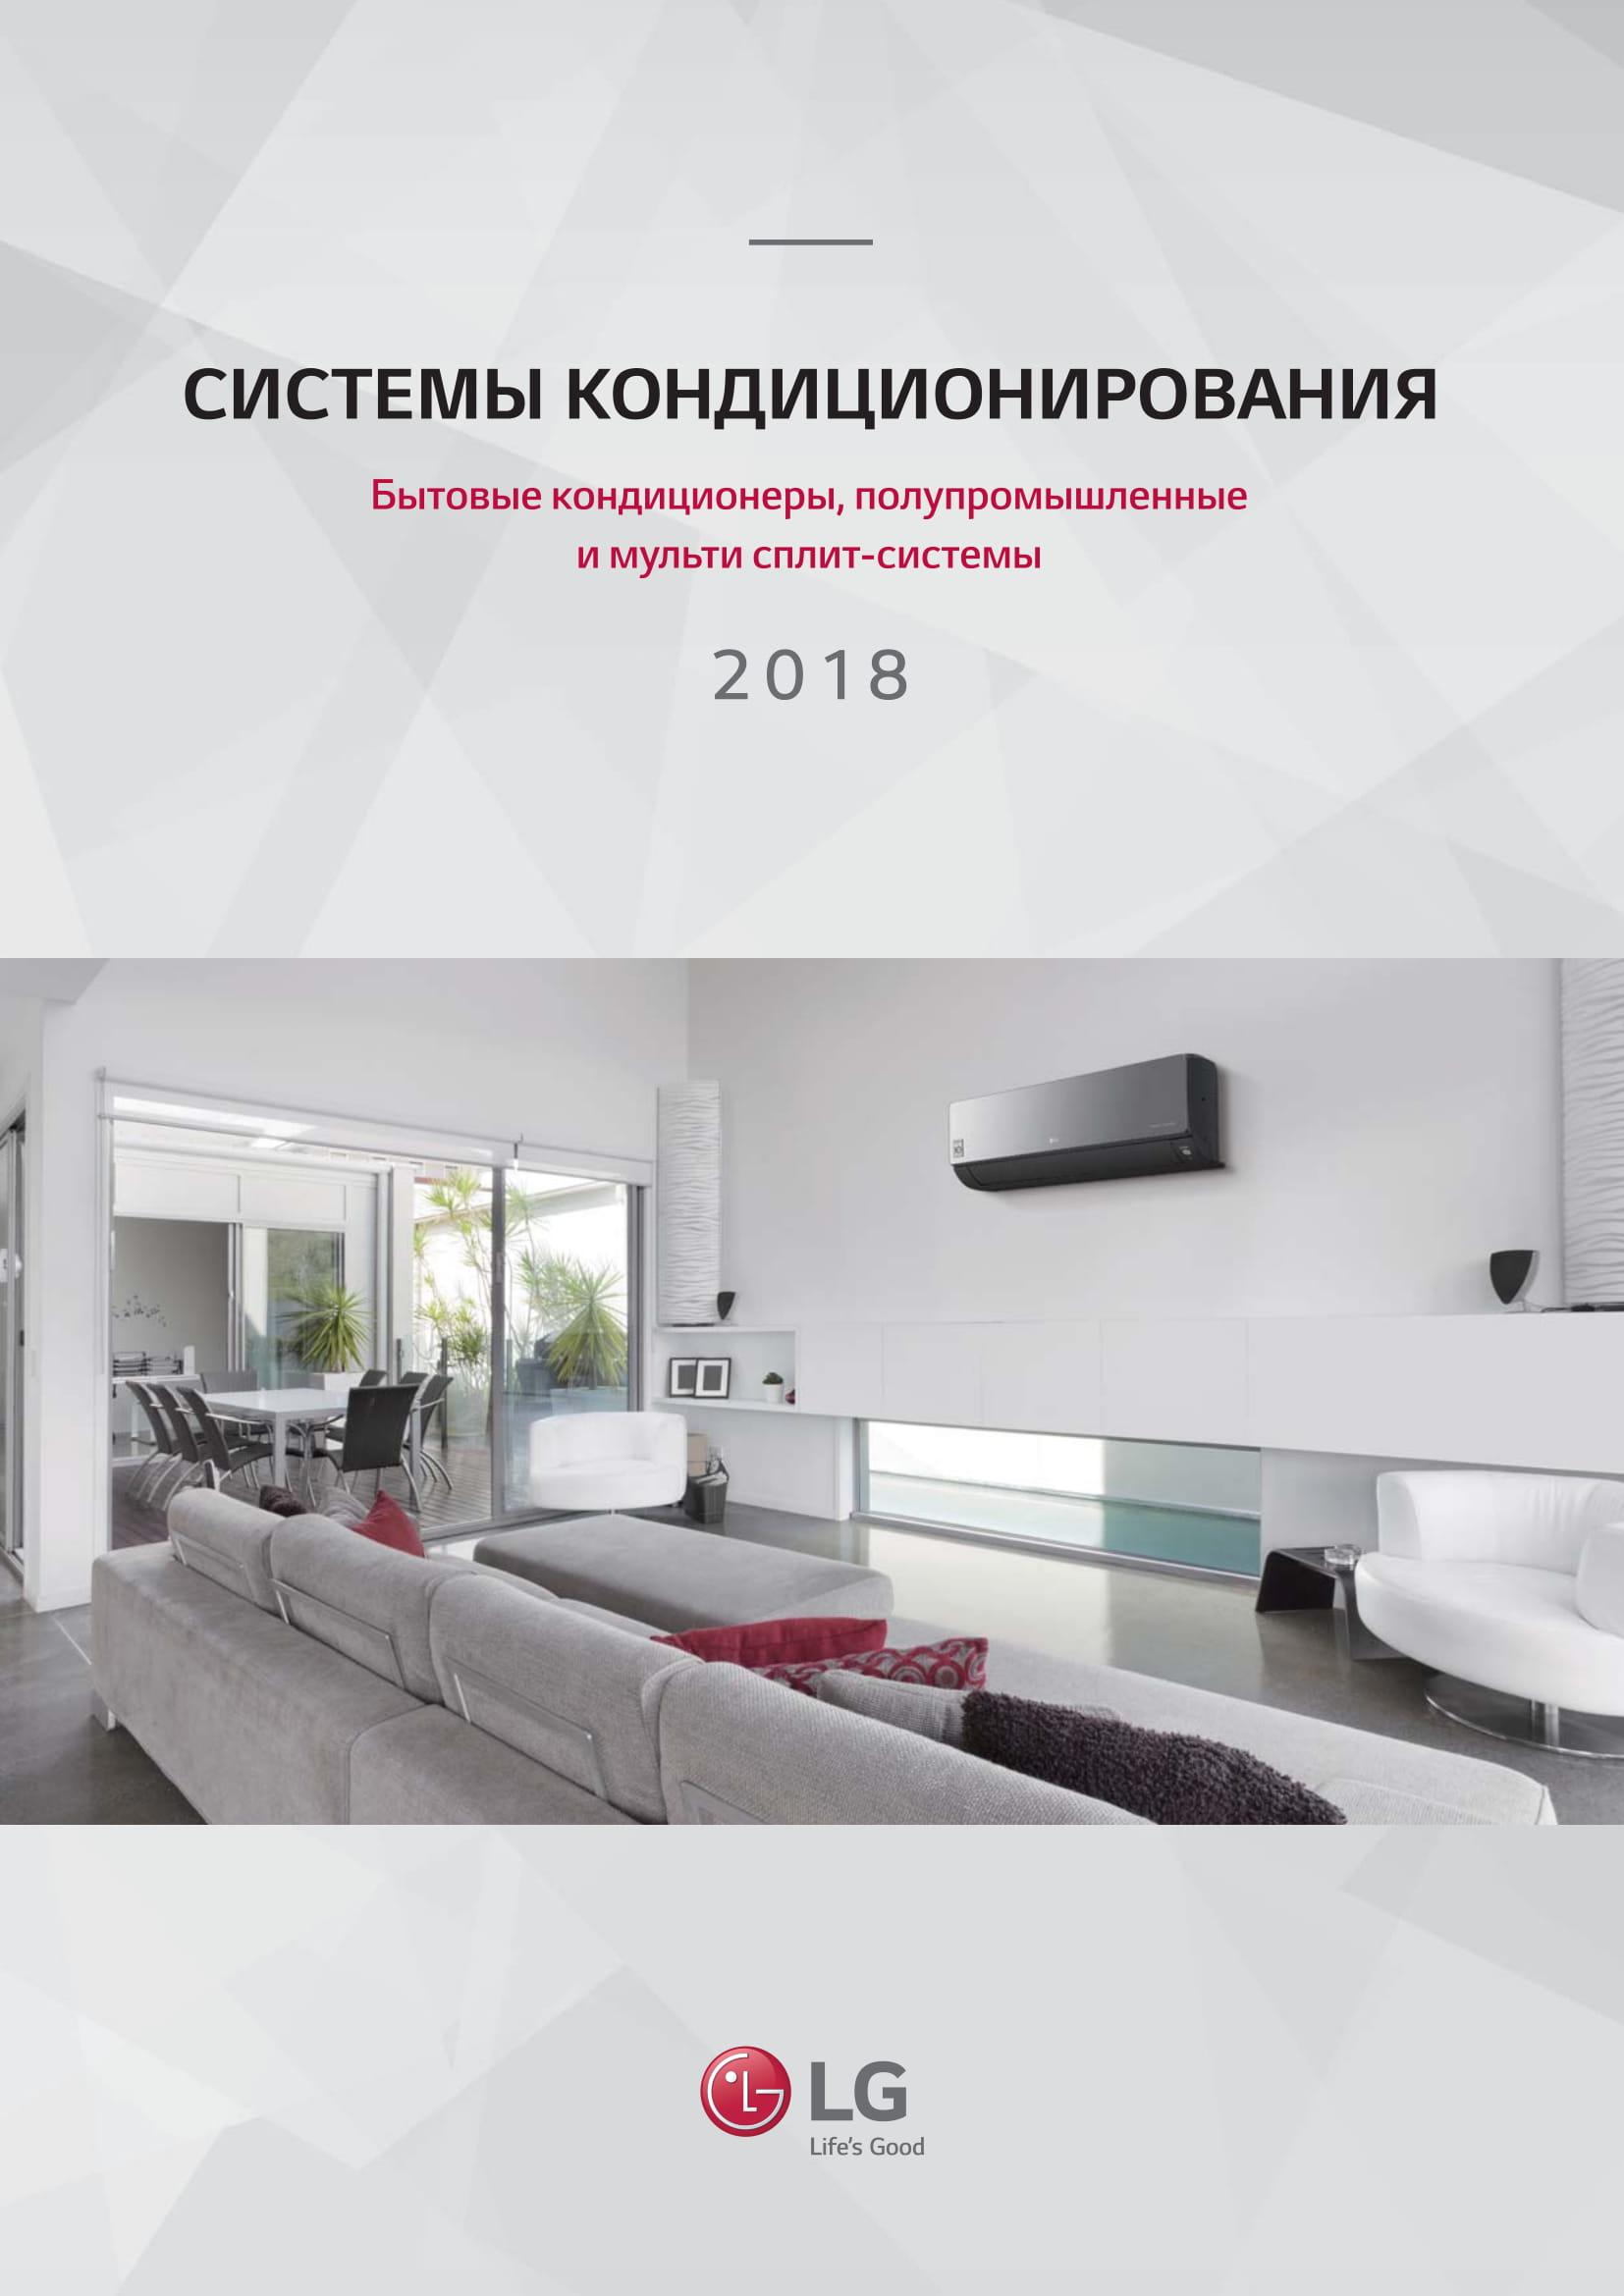 каталог LG 2018